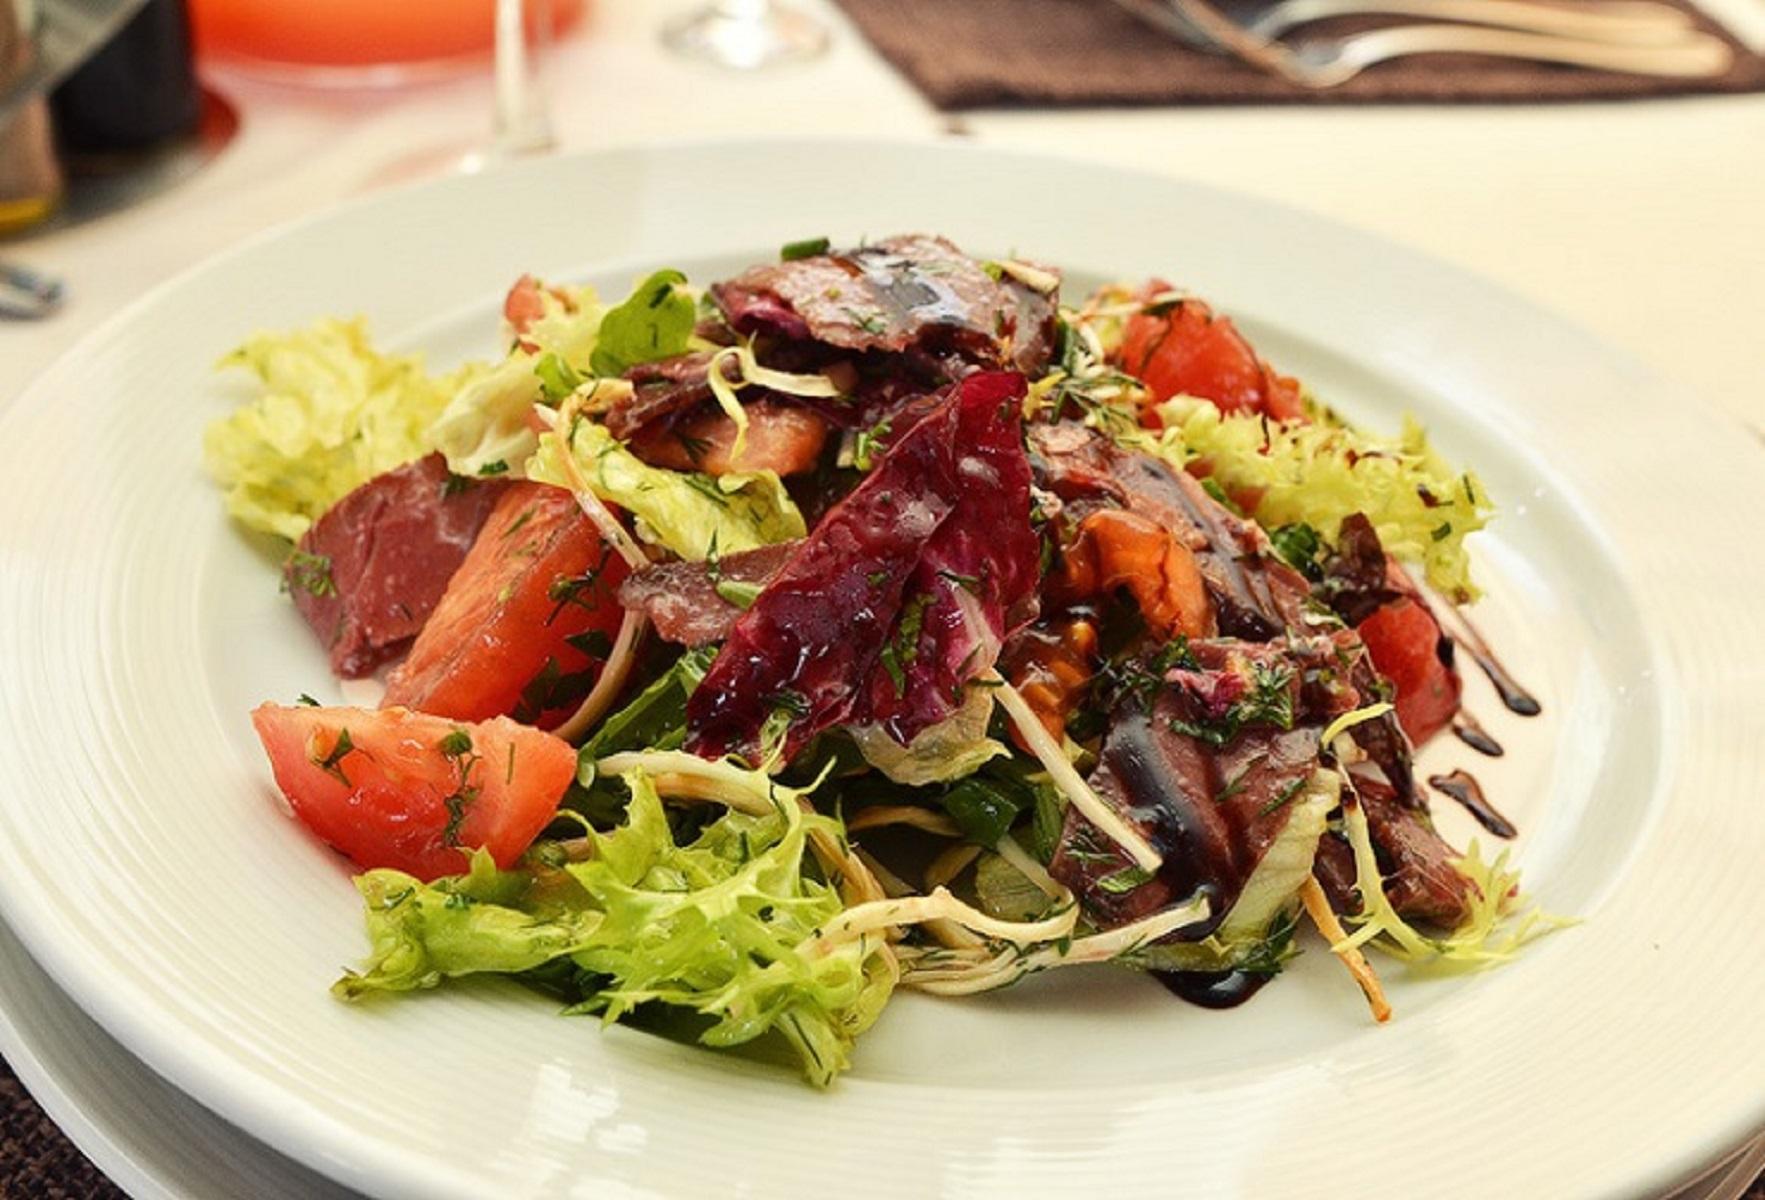 Салат из бастурмы с персиком